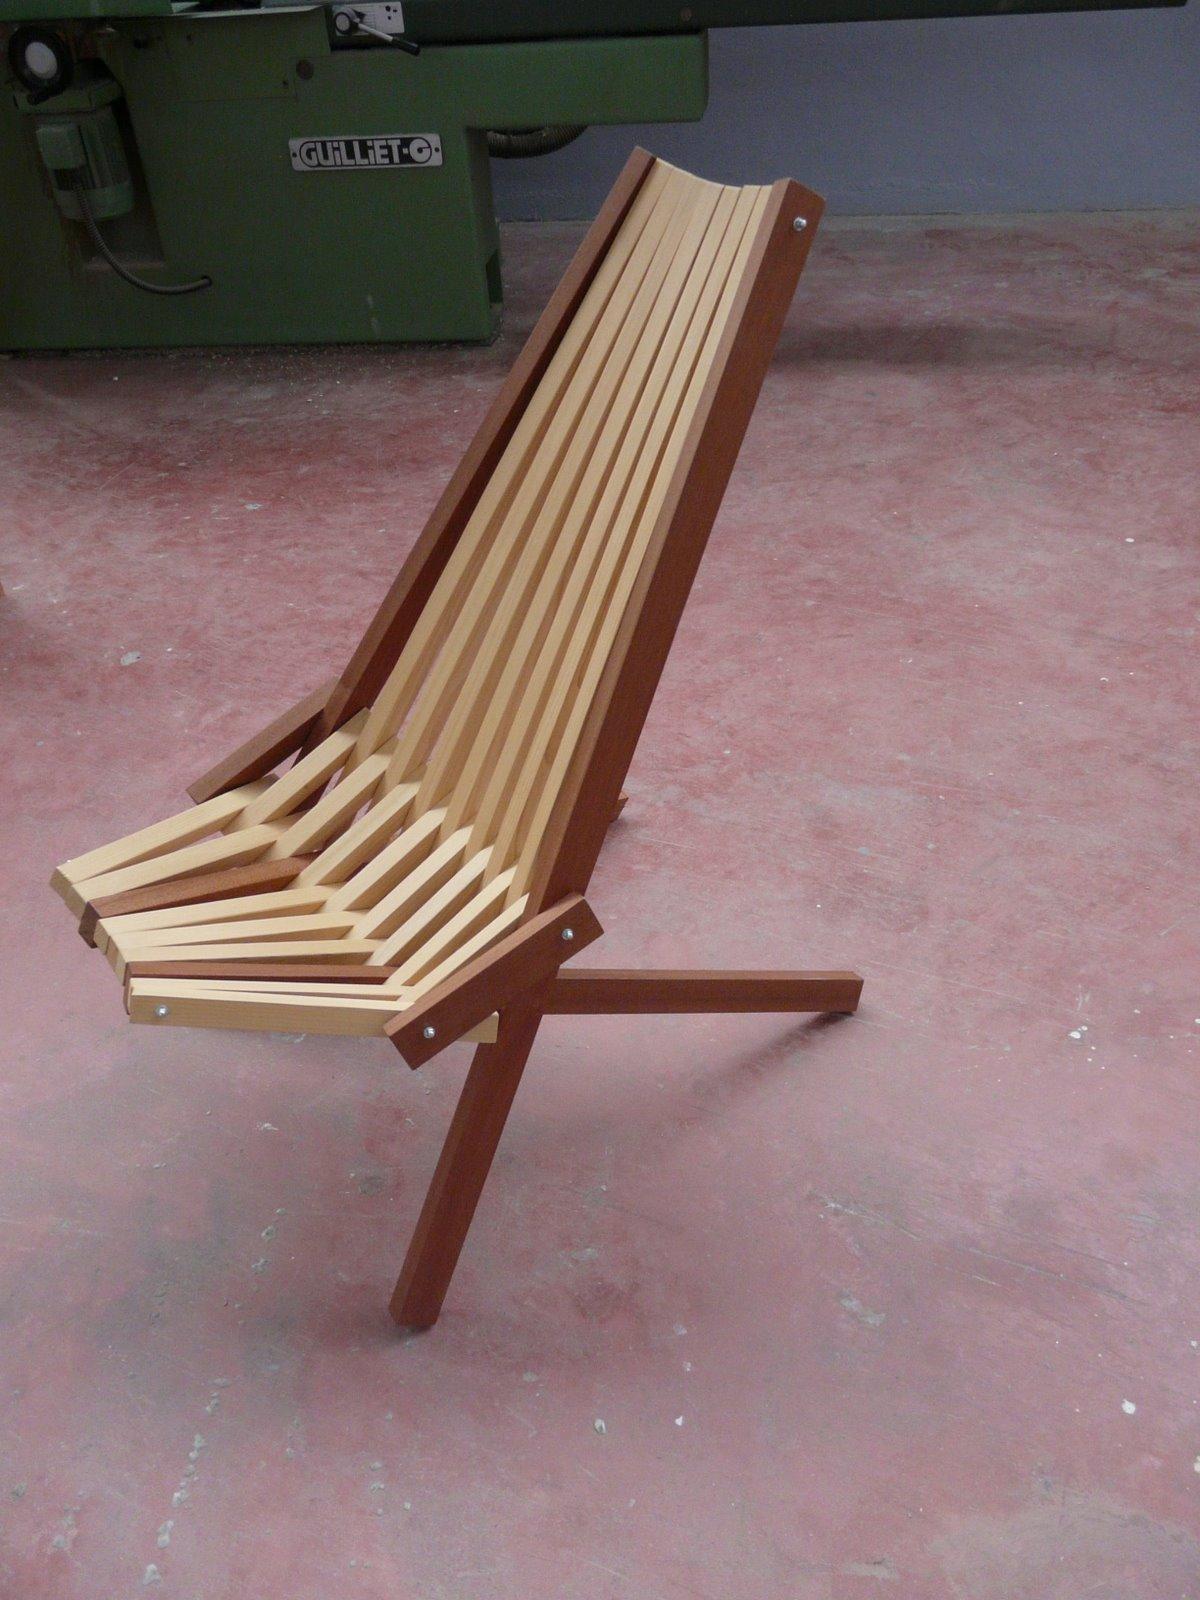 chaise africaine pliante le bois au lyc e sacr coeur. Black Bedroom Furniture Sets. Home Design Ideas